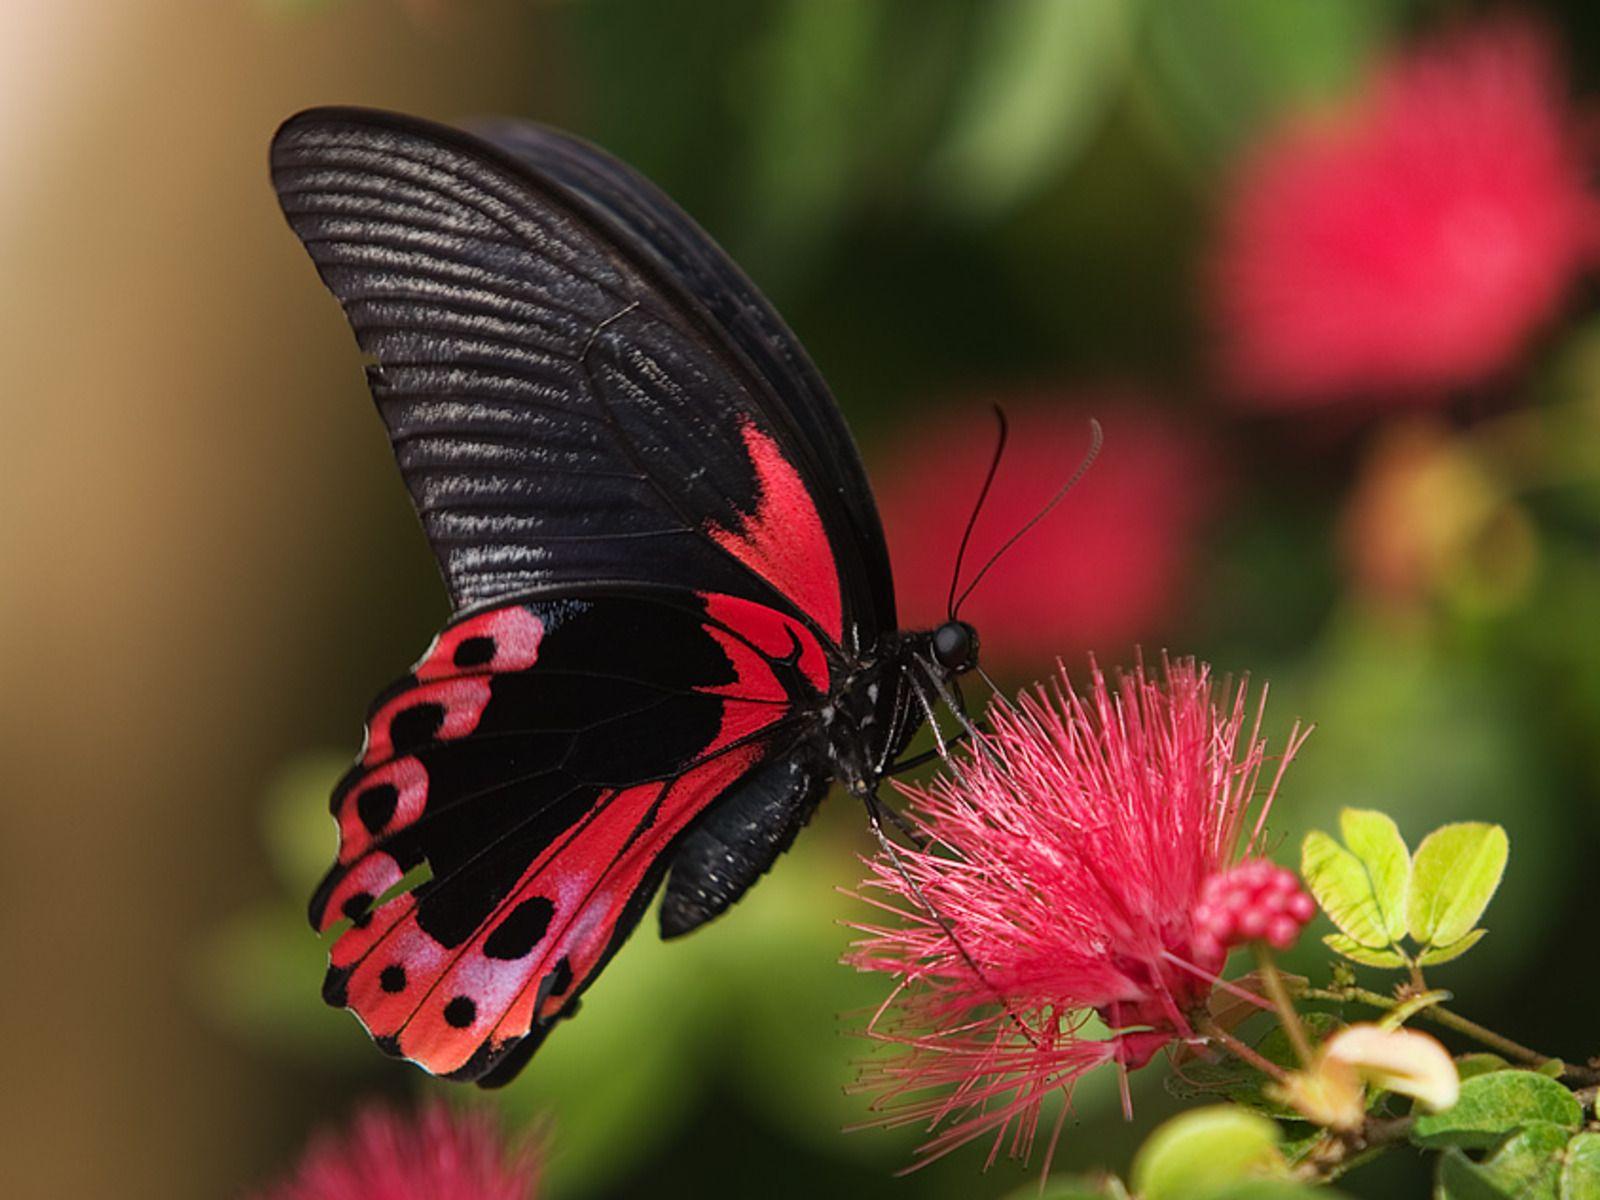 20 Colourful Butterflies Hd Wallpapers Wonderwordz Butterfly Wallpaper Butterfly Live Colorful Butterflies